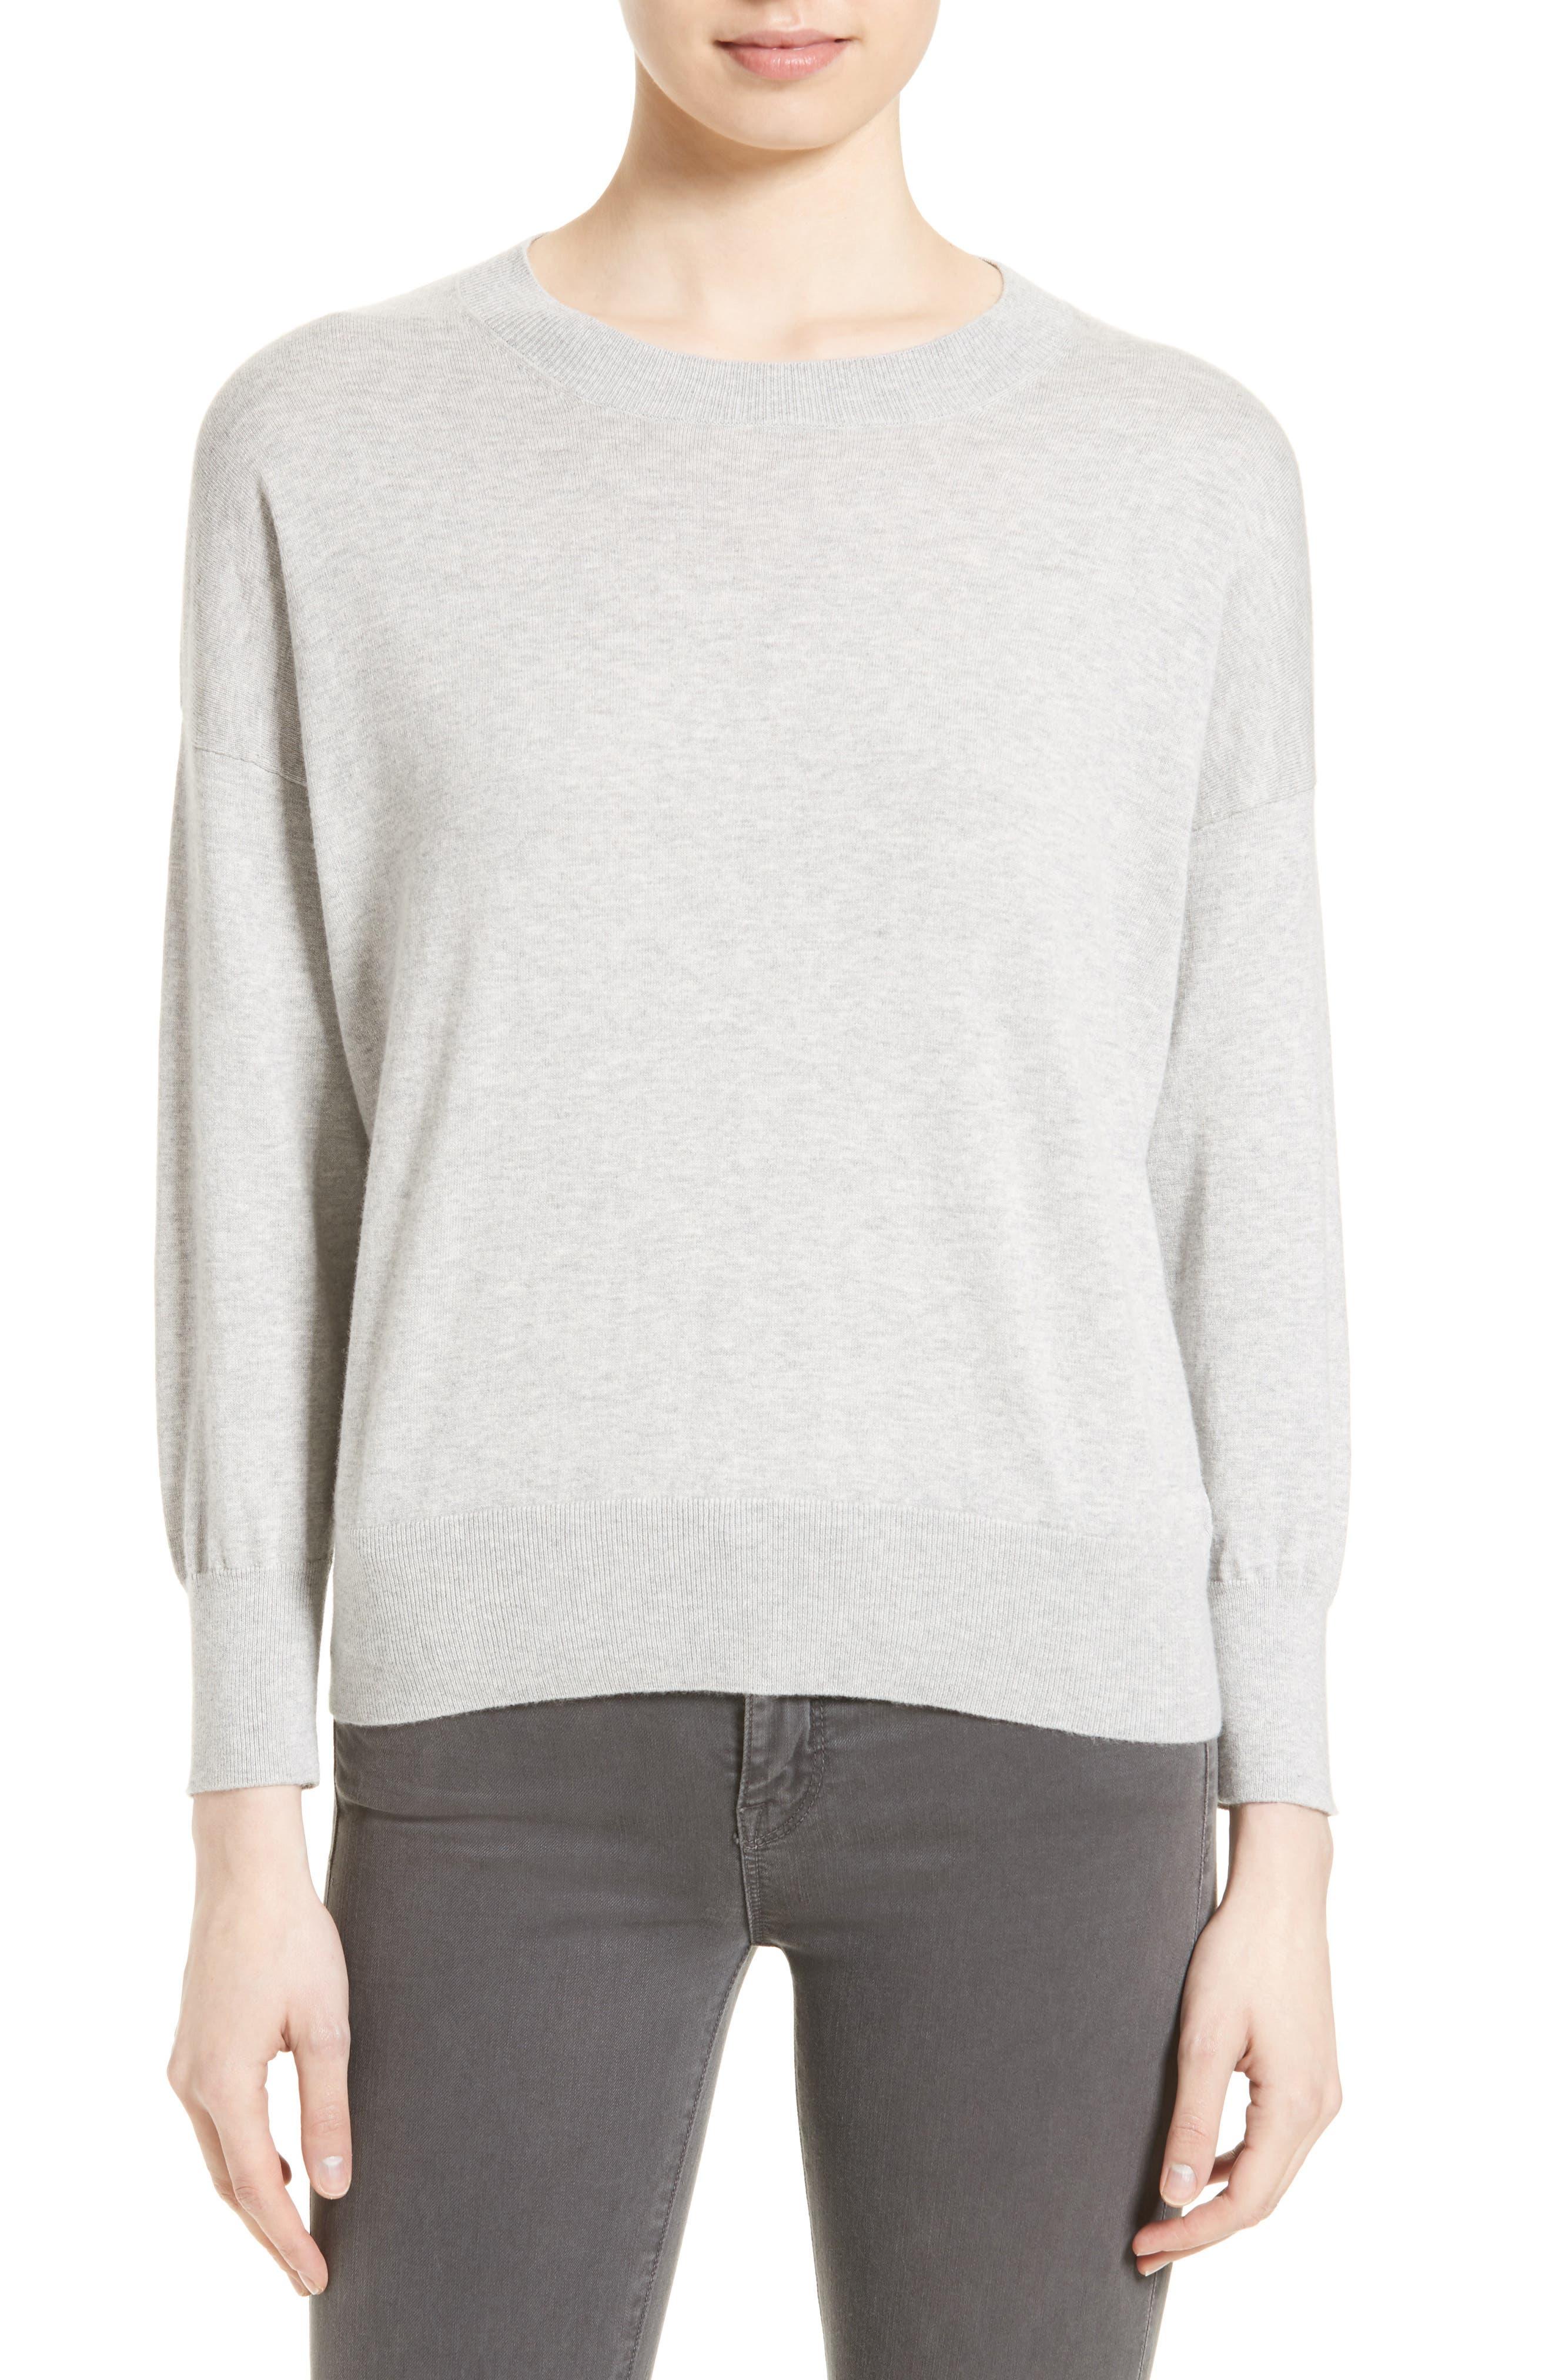 Melanie Cotton & Cashmere Pullover,                         Main,                         color, Light Heather Grey